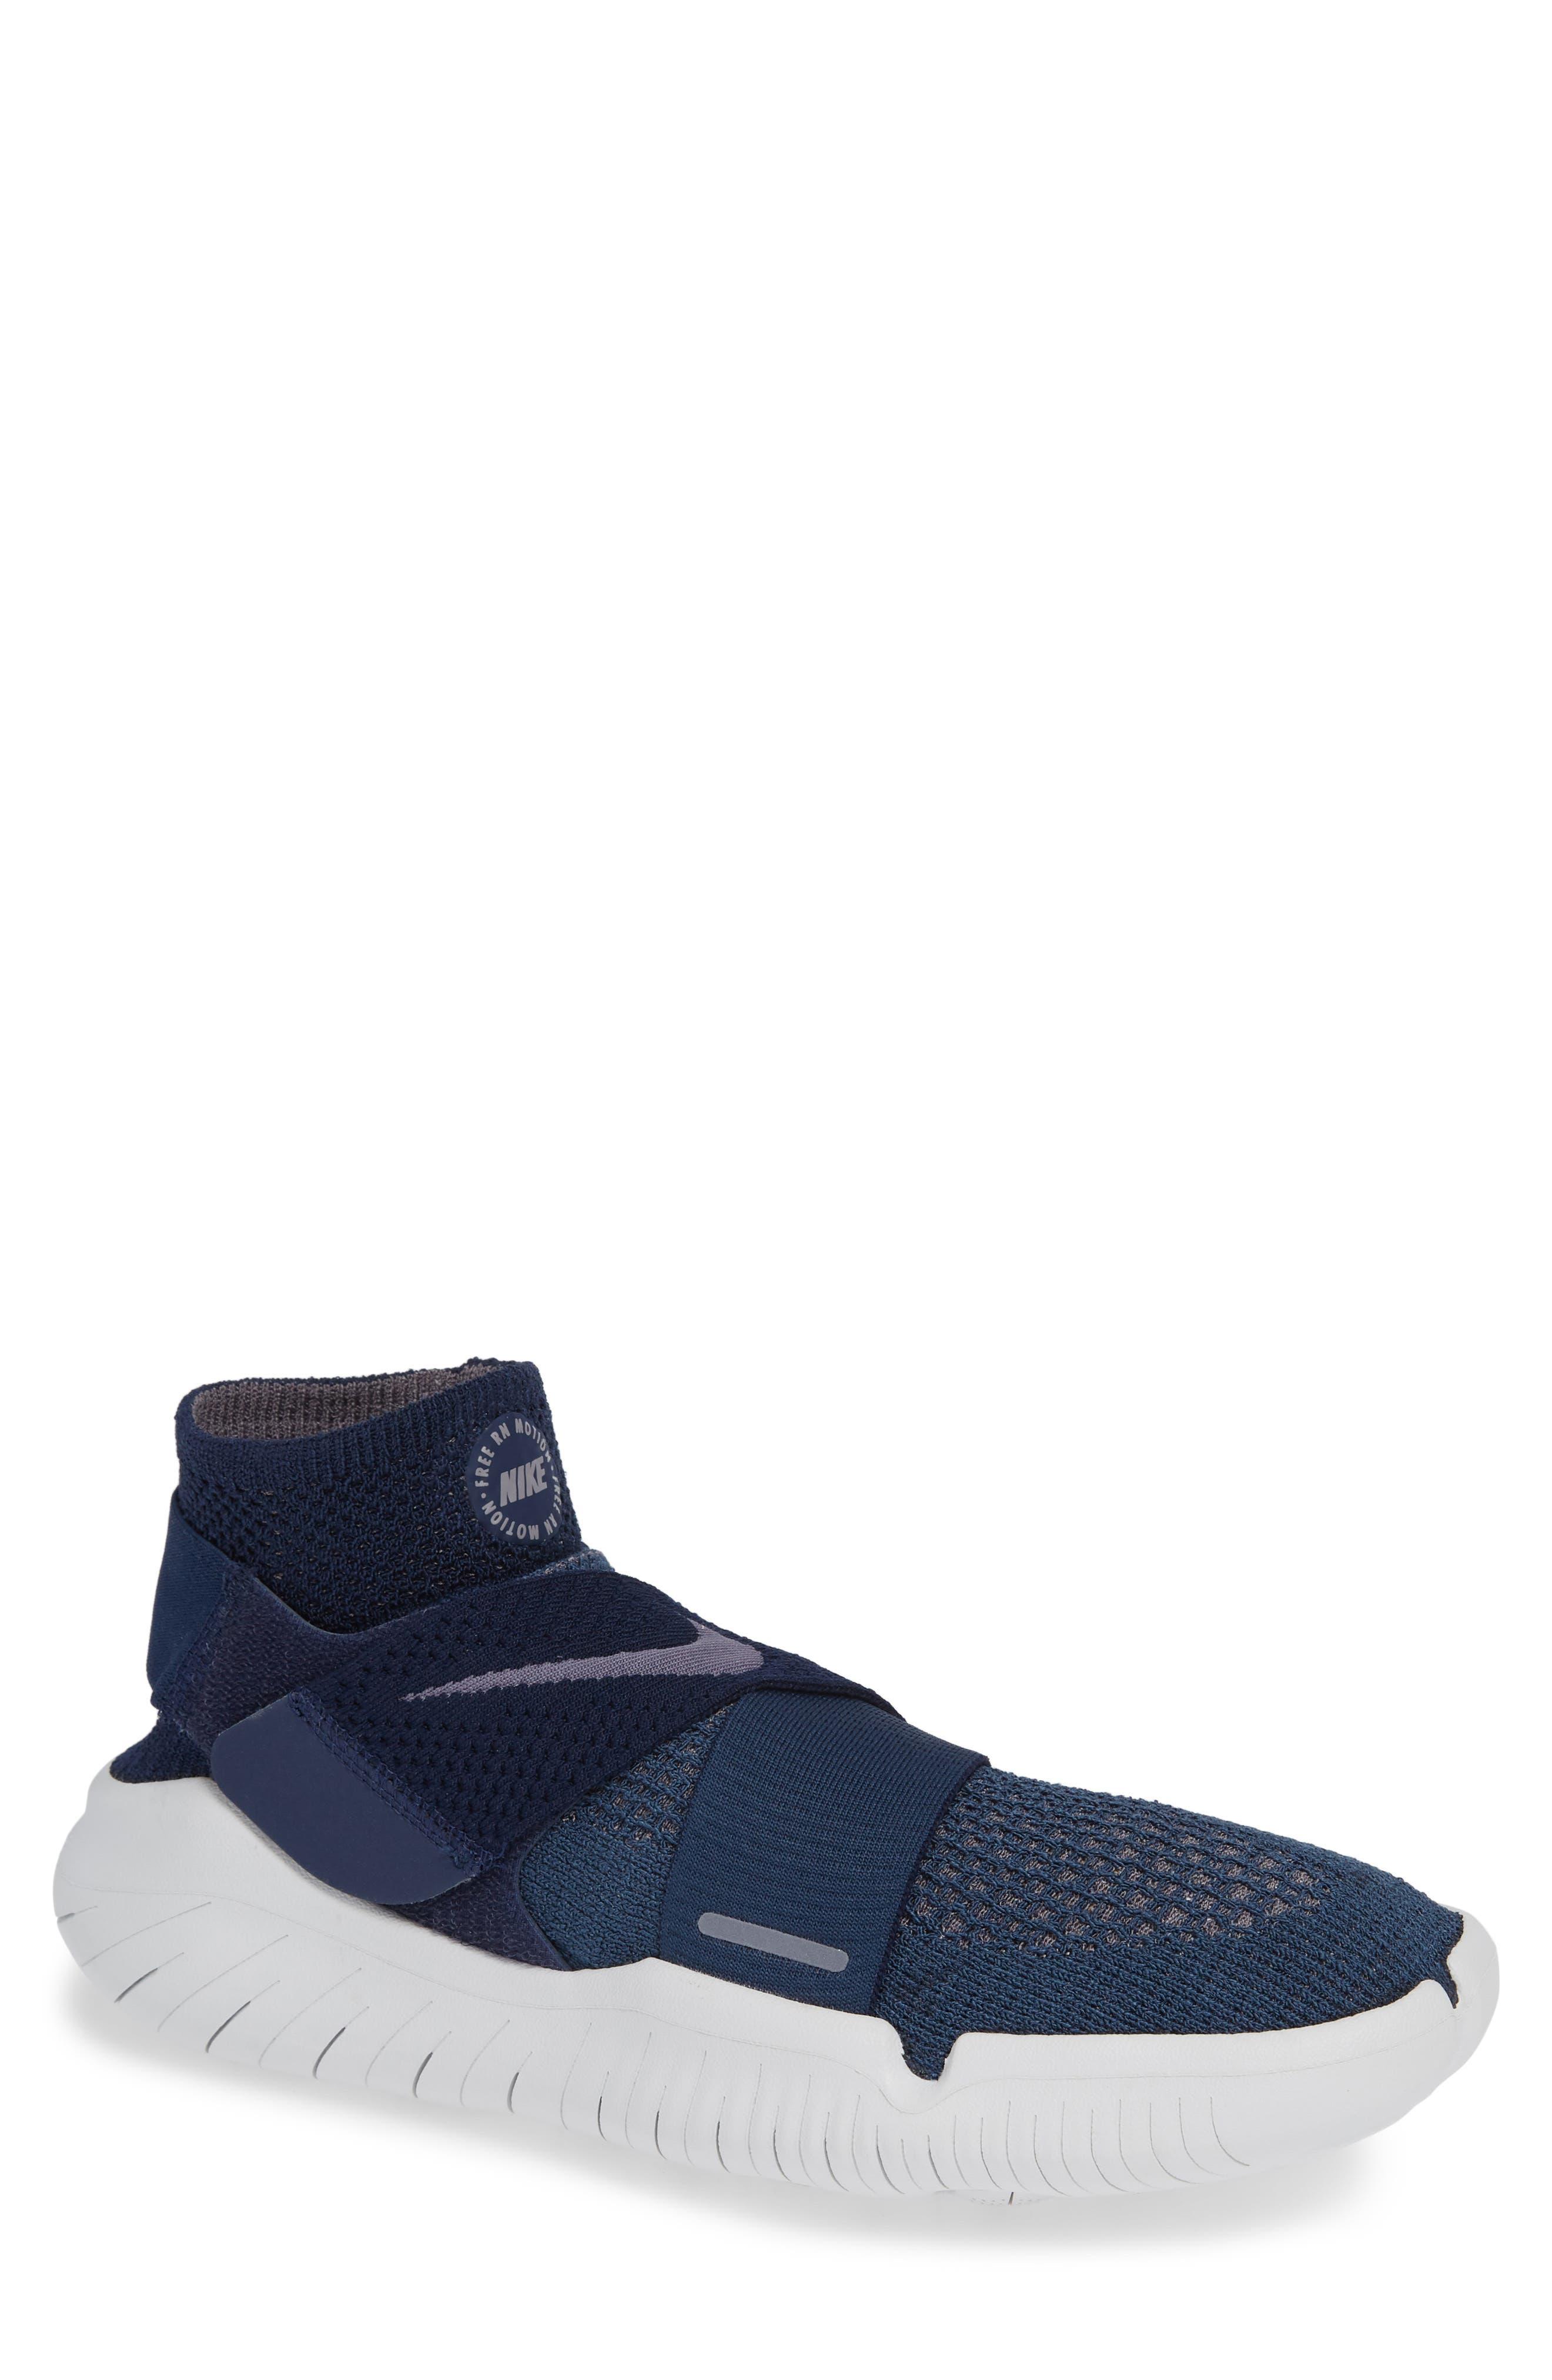 Free RN Motion 2018 Flyknit Running Shoe,                         Main,                         color, Squadron Blue/ Gunsmoke